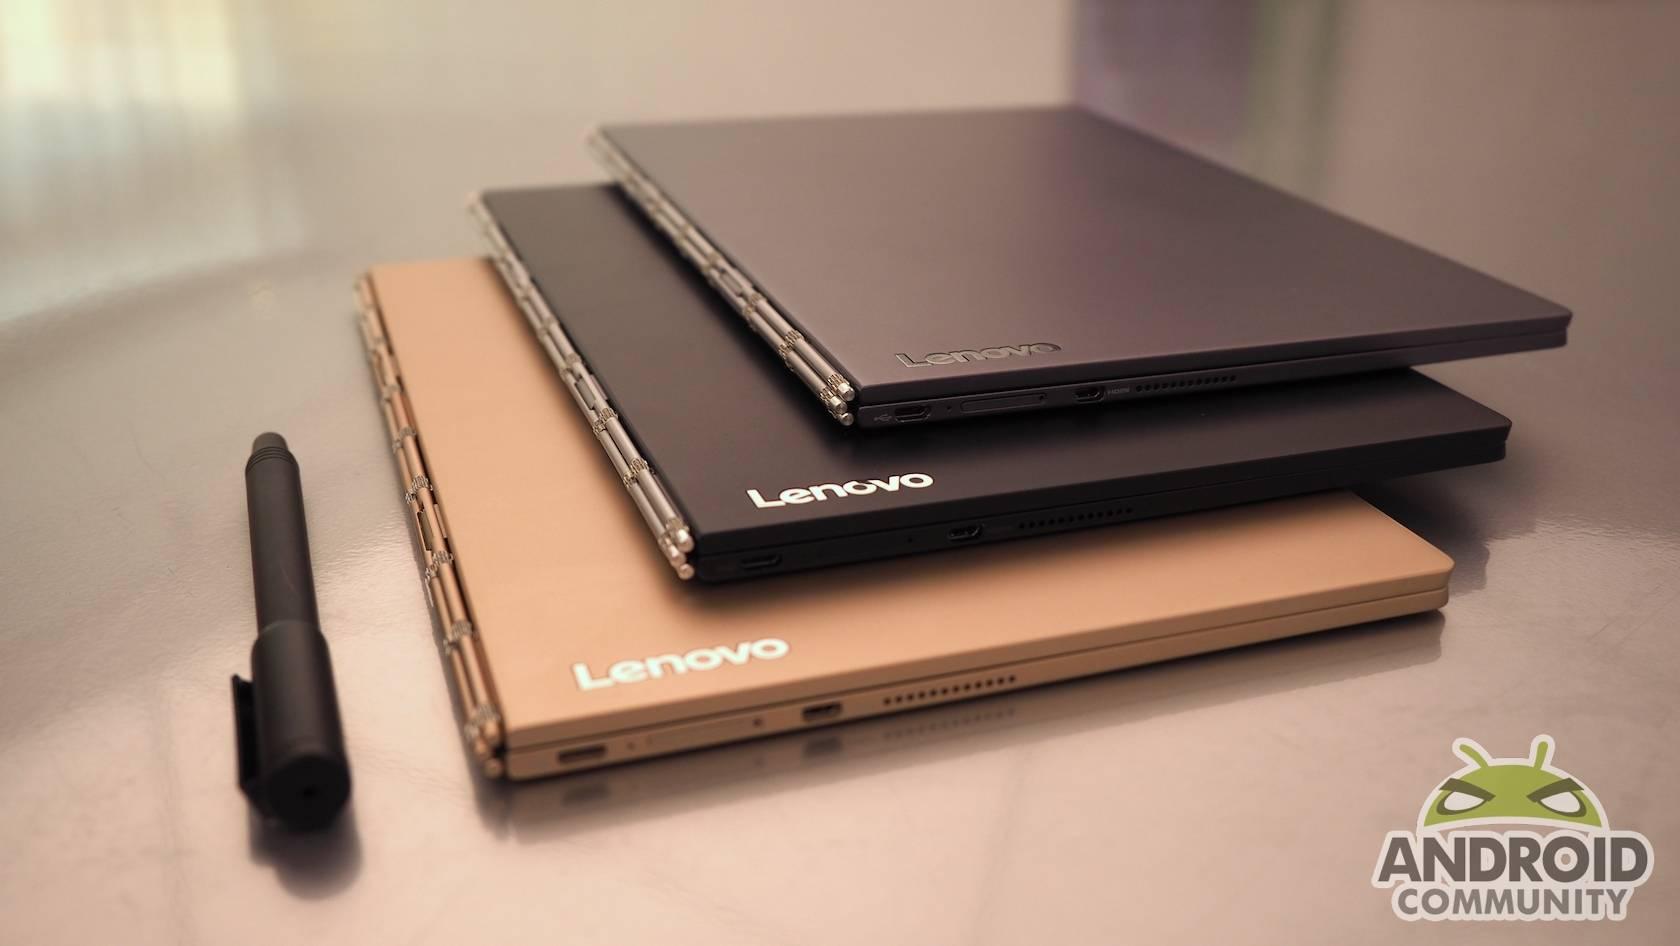 lenovo-yoga-book-hands-on-ac-7